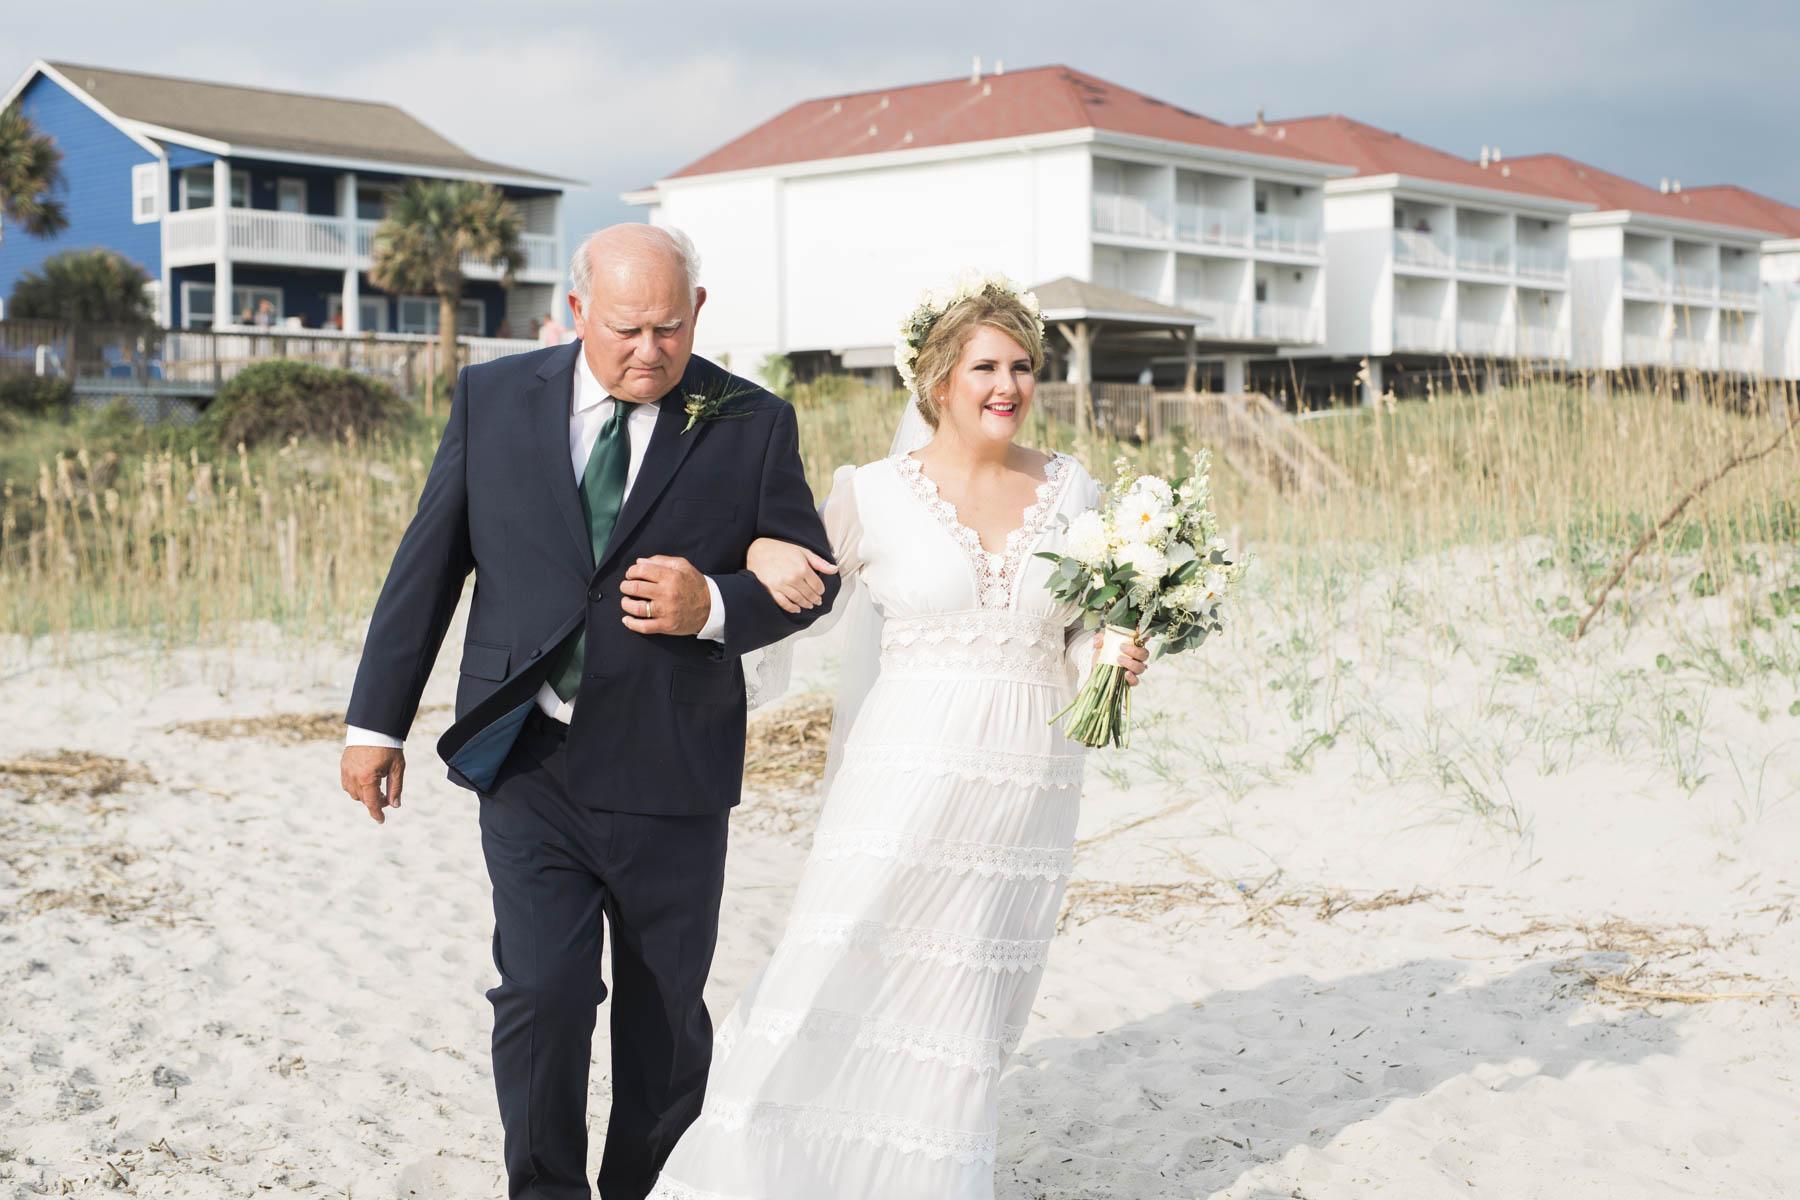 shotbychelsea_wedding_blog-25.jpg